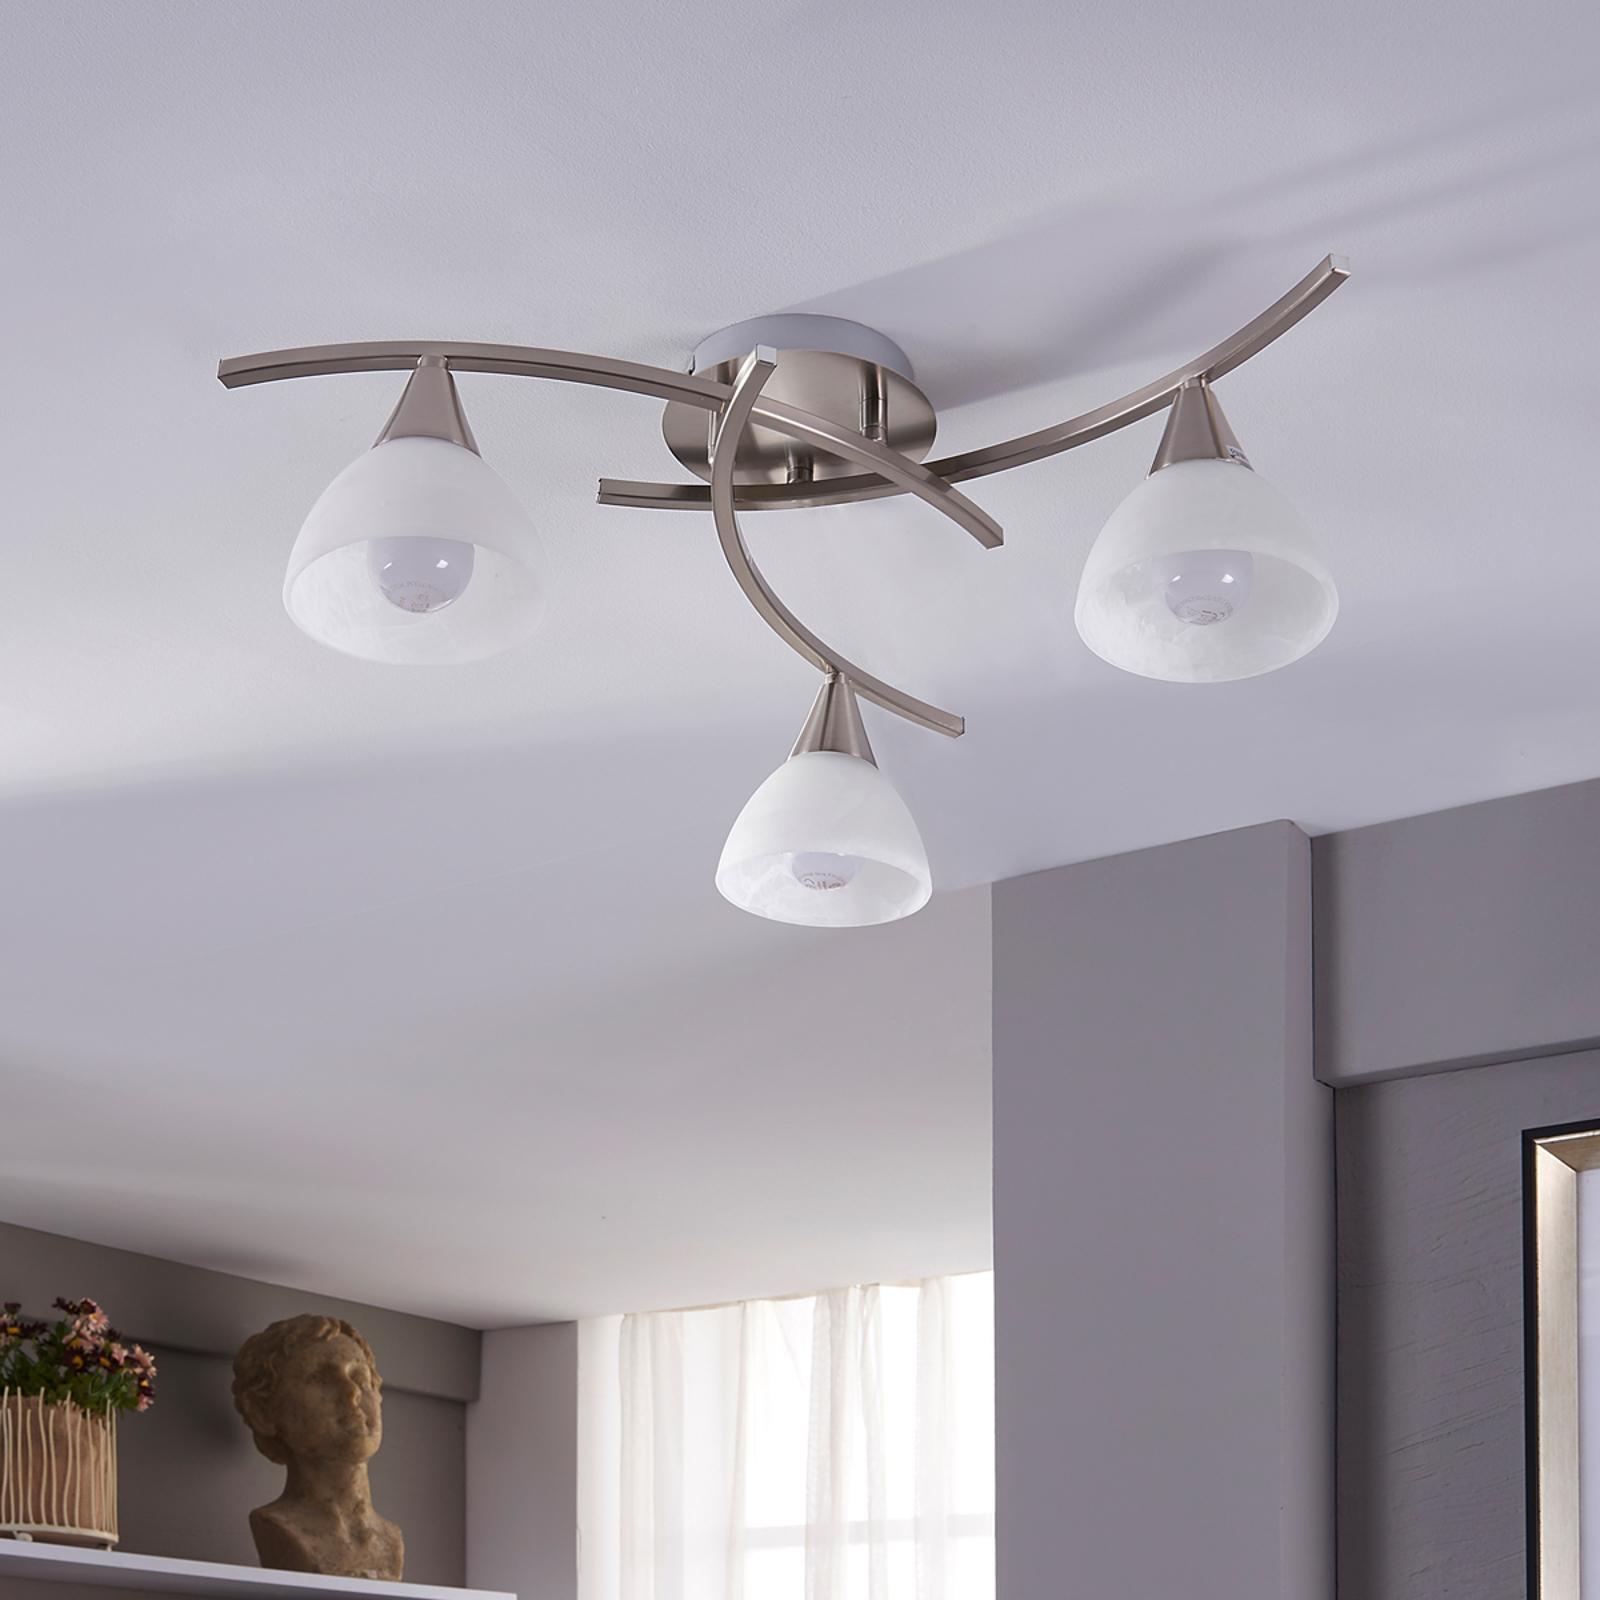 Della - lampa sufitowa LED, matowy nikiel, 3-pkt.